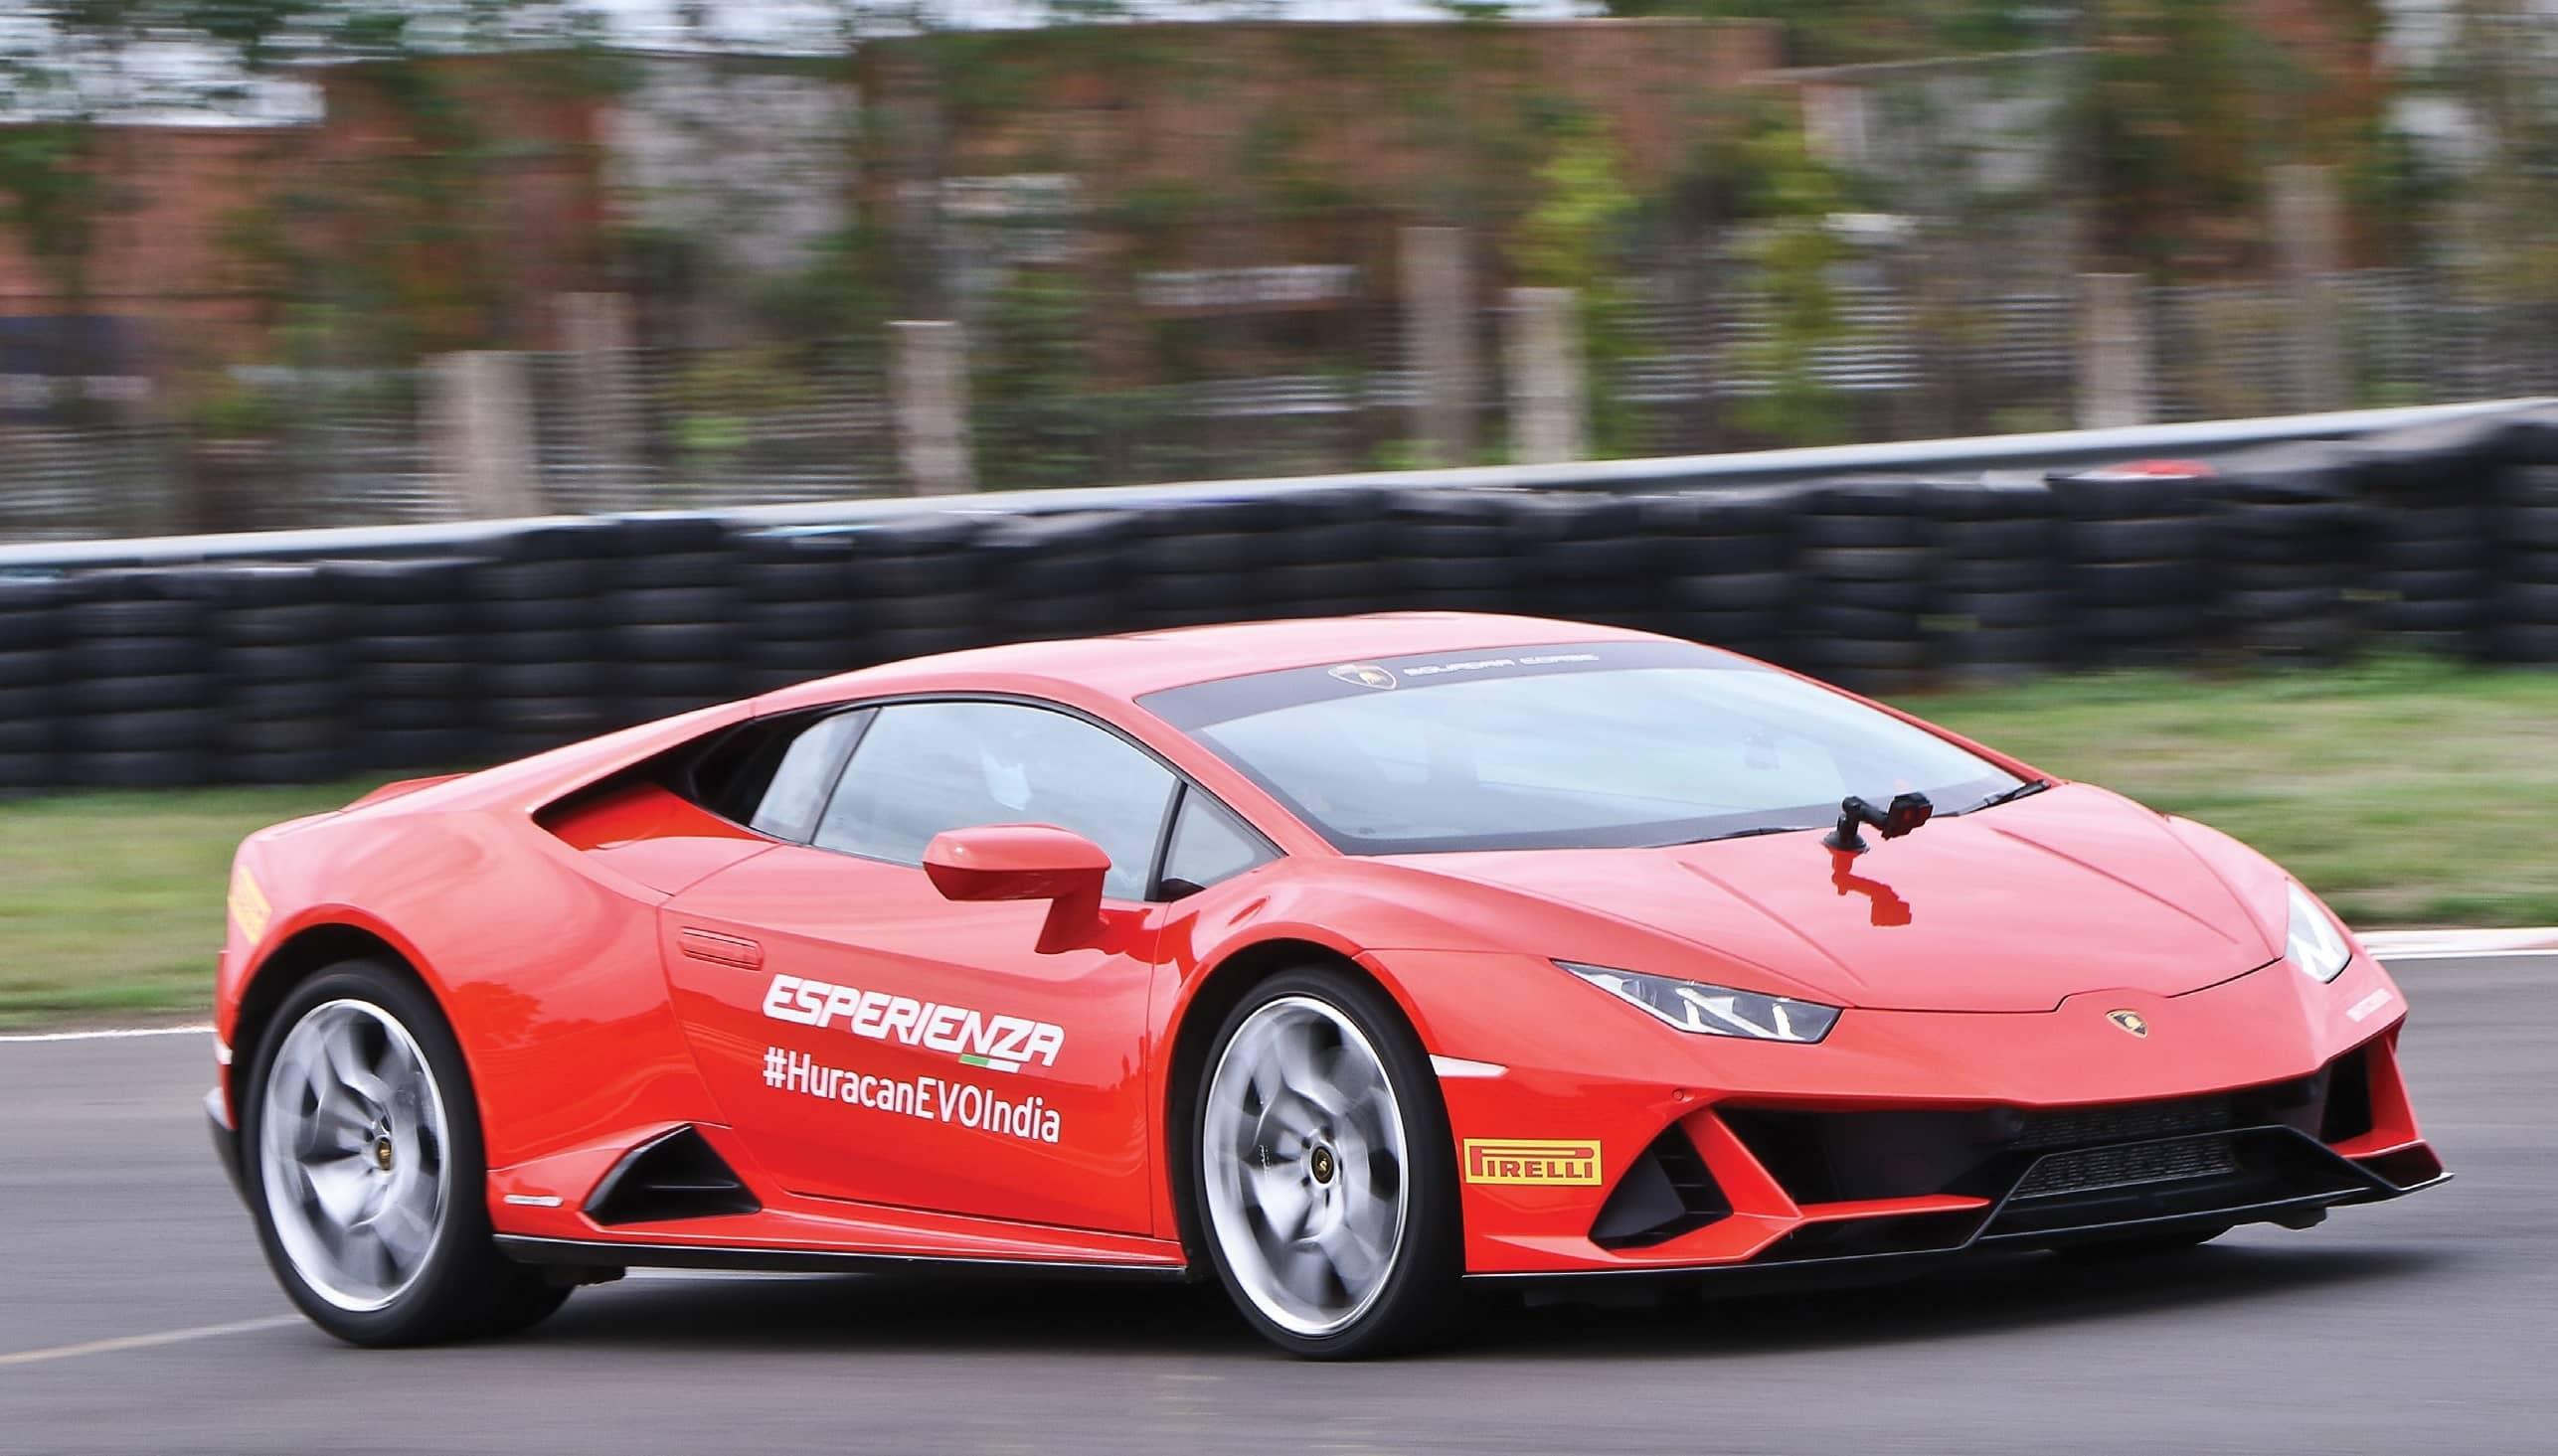 Lamborghini Huracan Evo - Taming The Raging Bull At The track